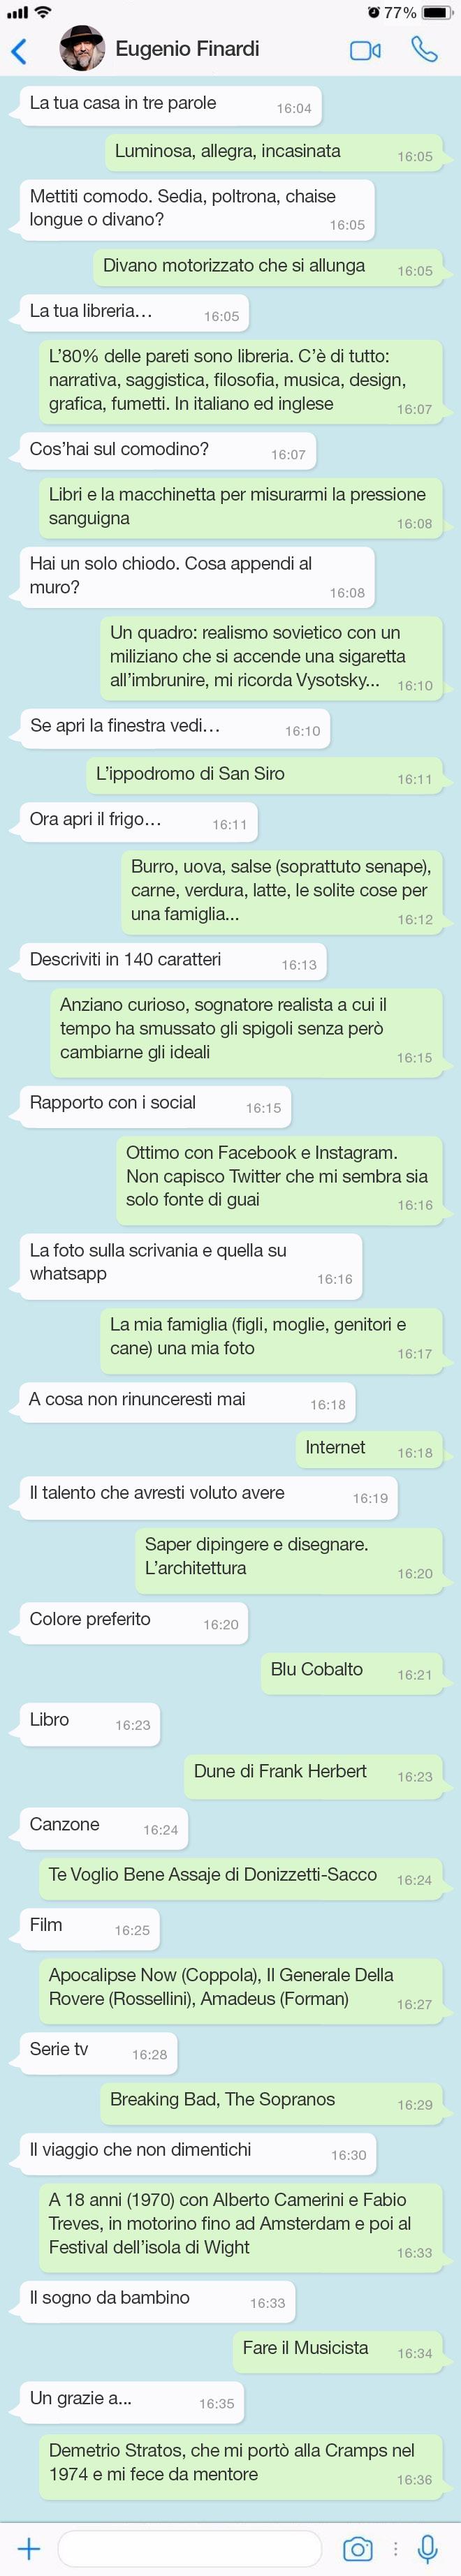 whatsapp-finardi